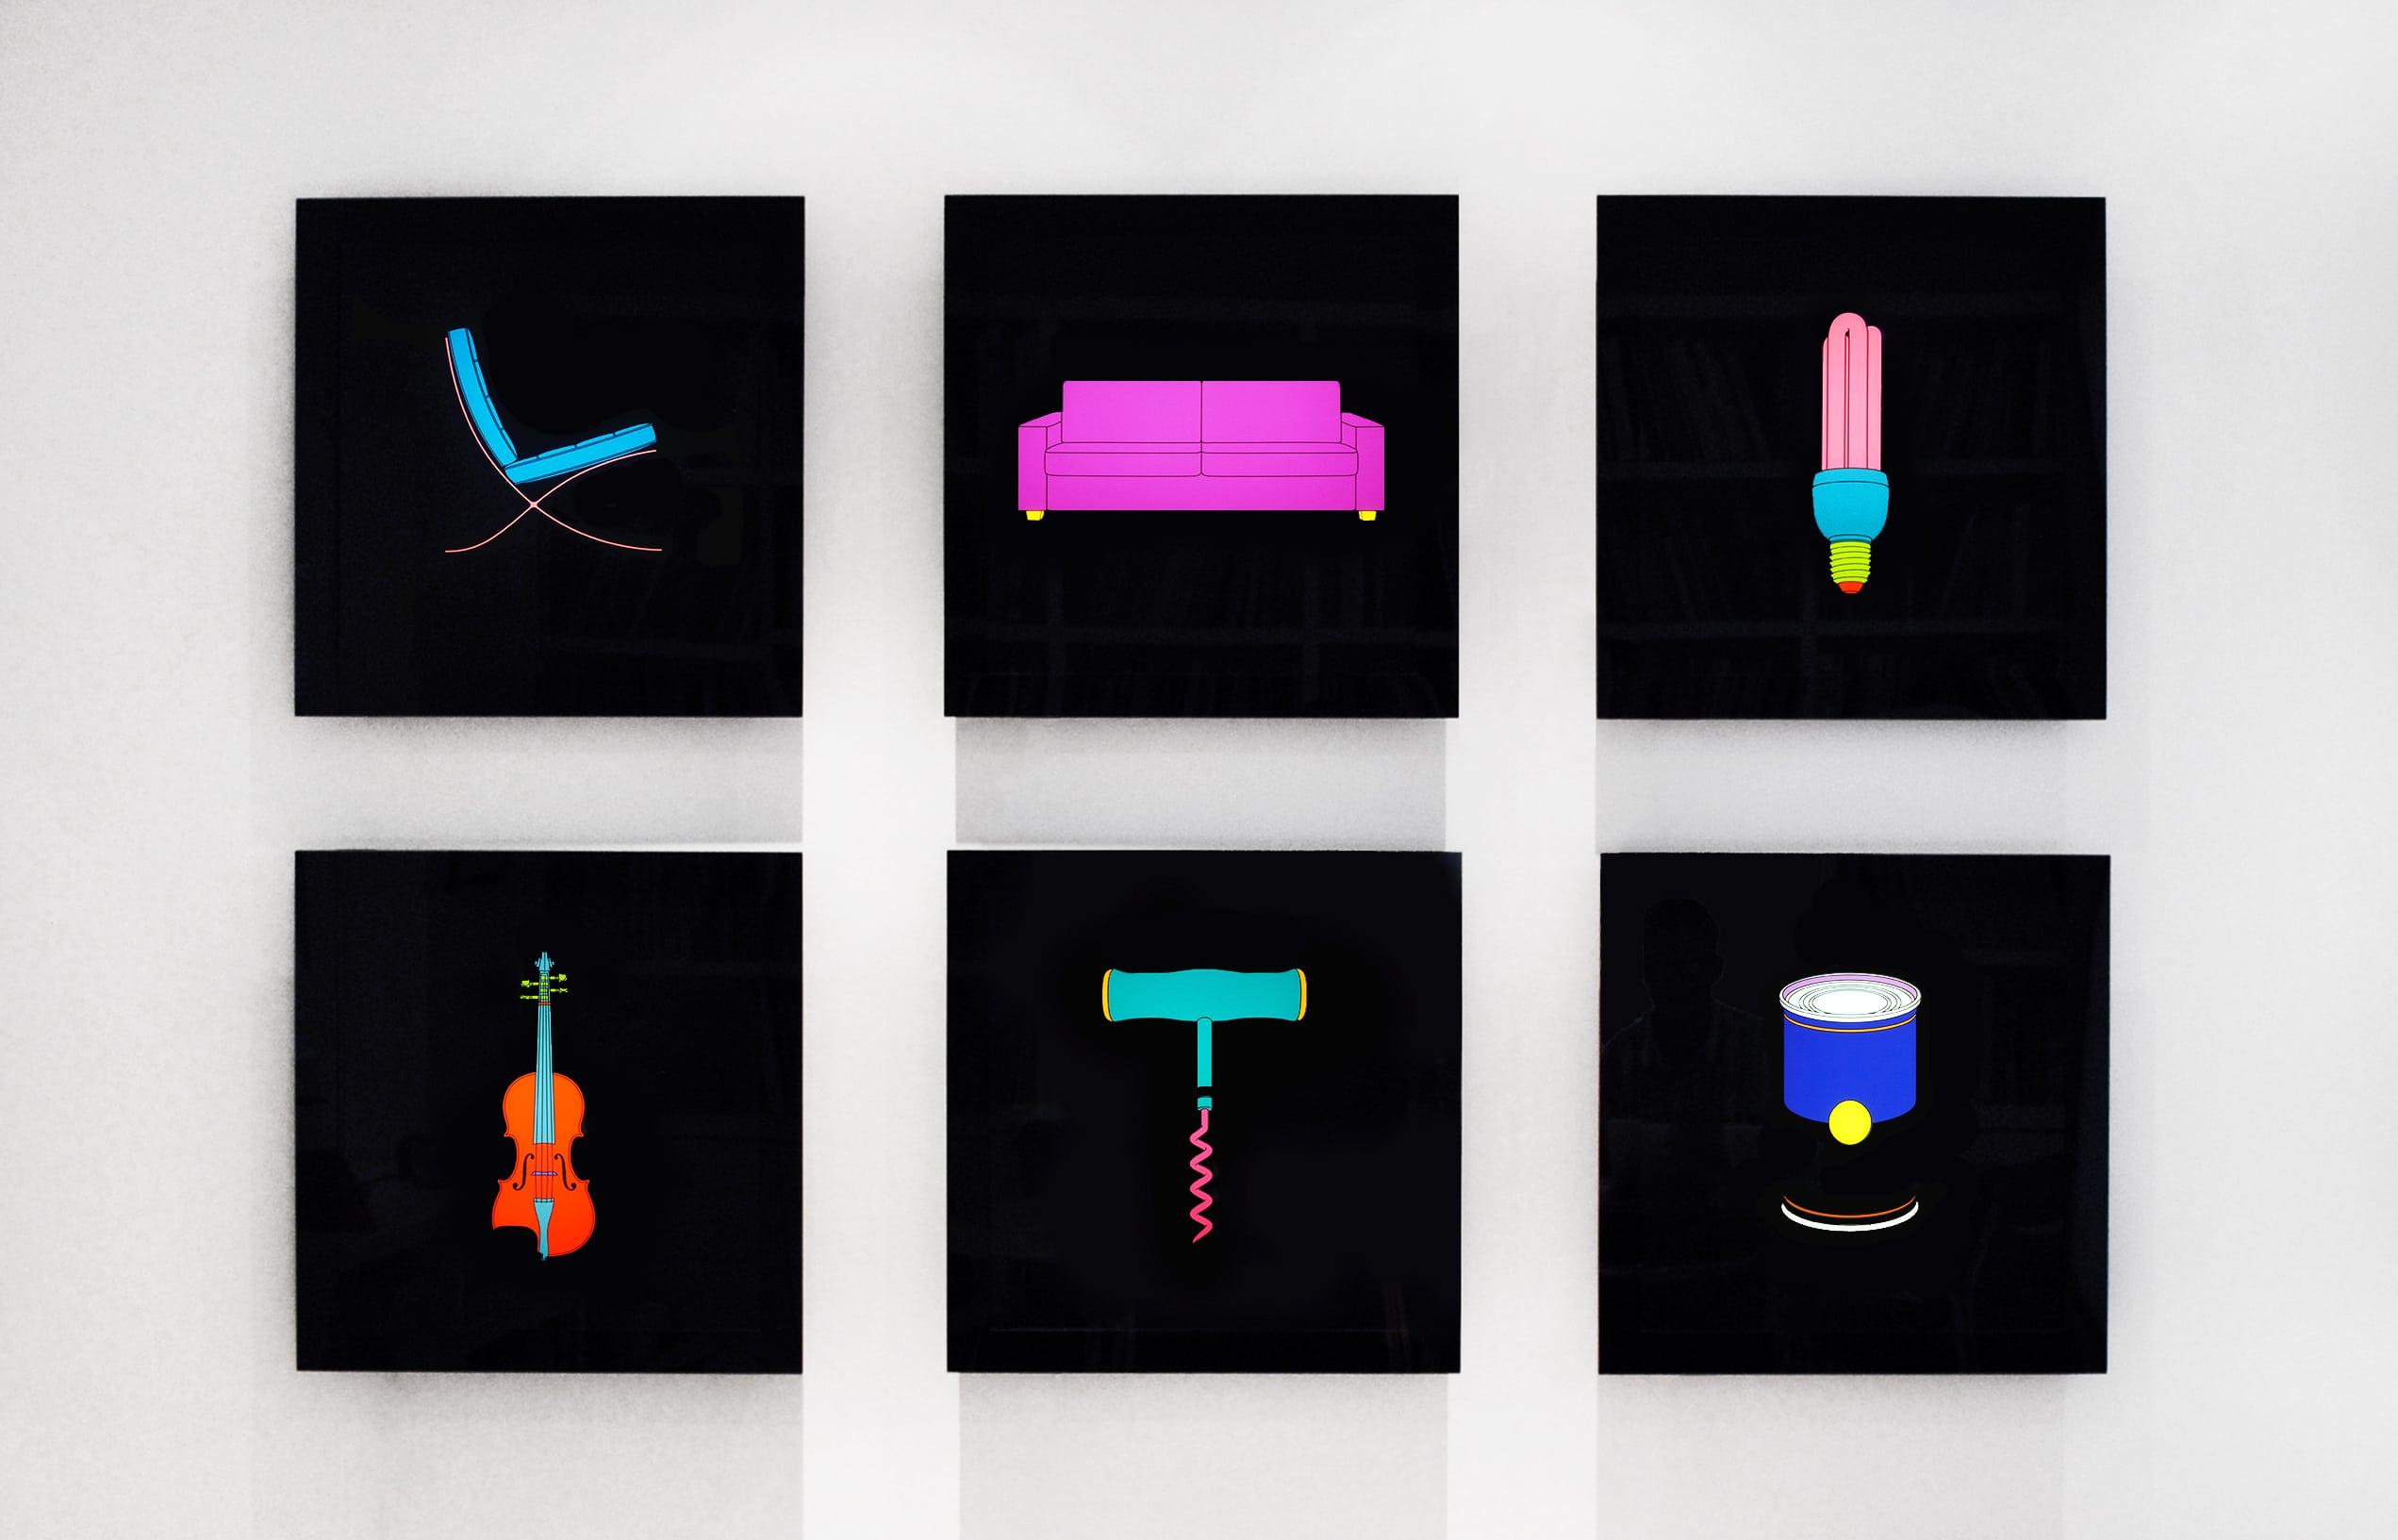 Michael Craig-Martin Installation of Chair Sofa Lightbulb Violin Corkscrew Soup Can